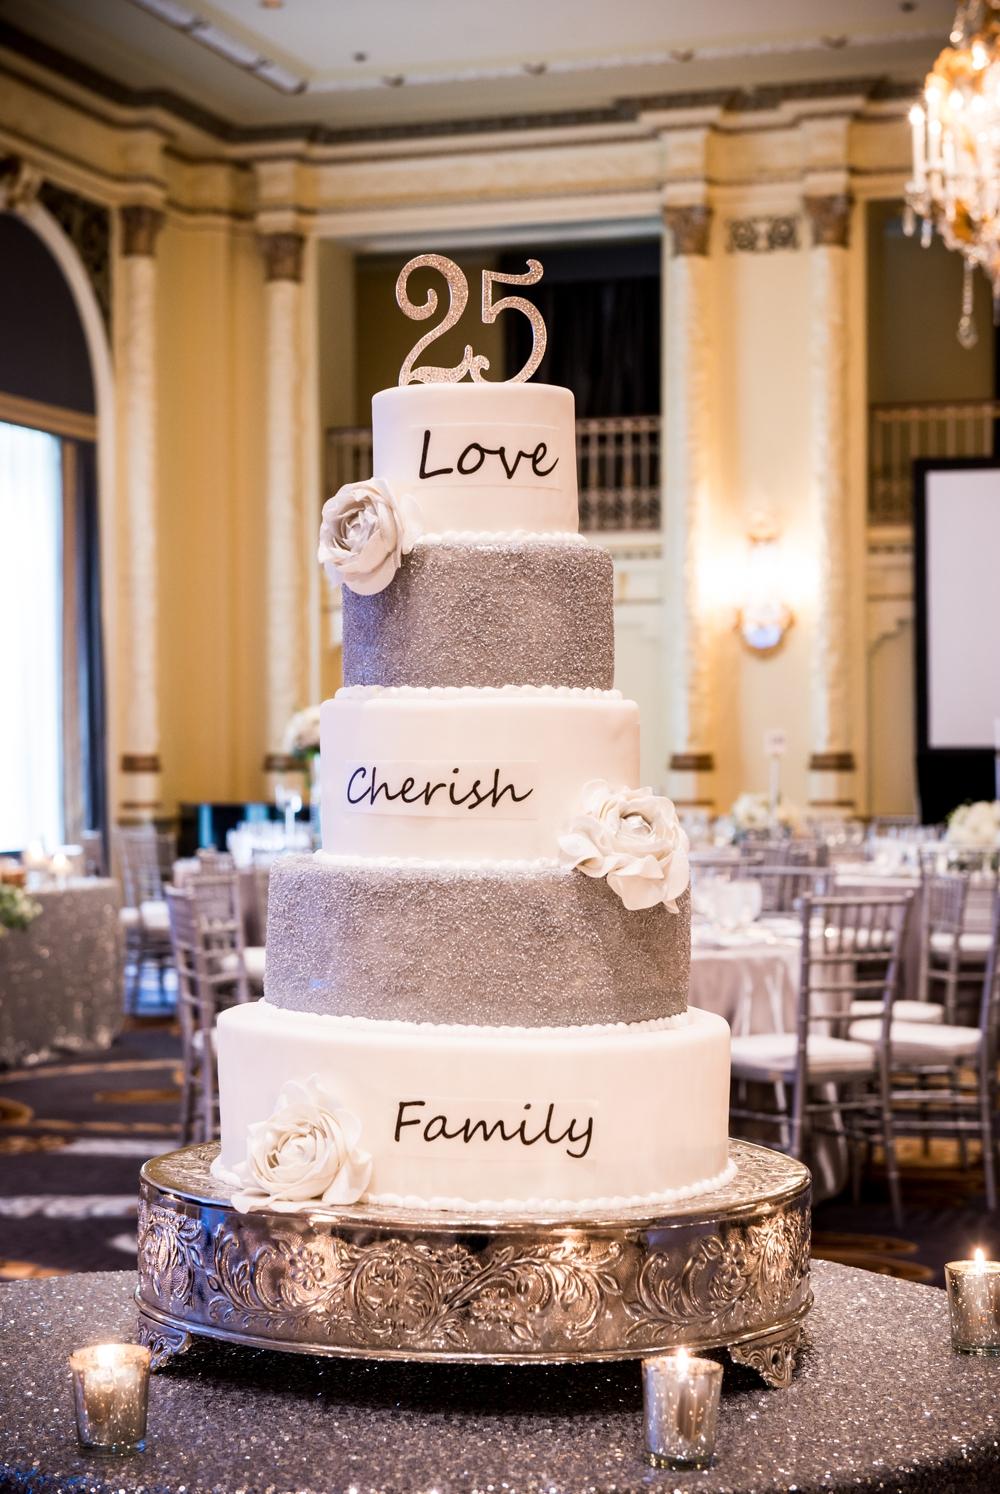 5-tiered-wedding-cake